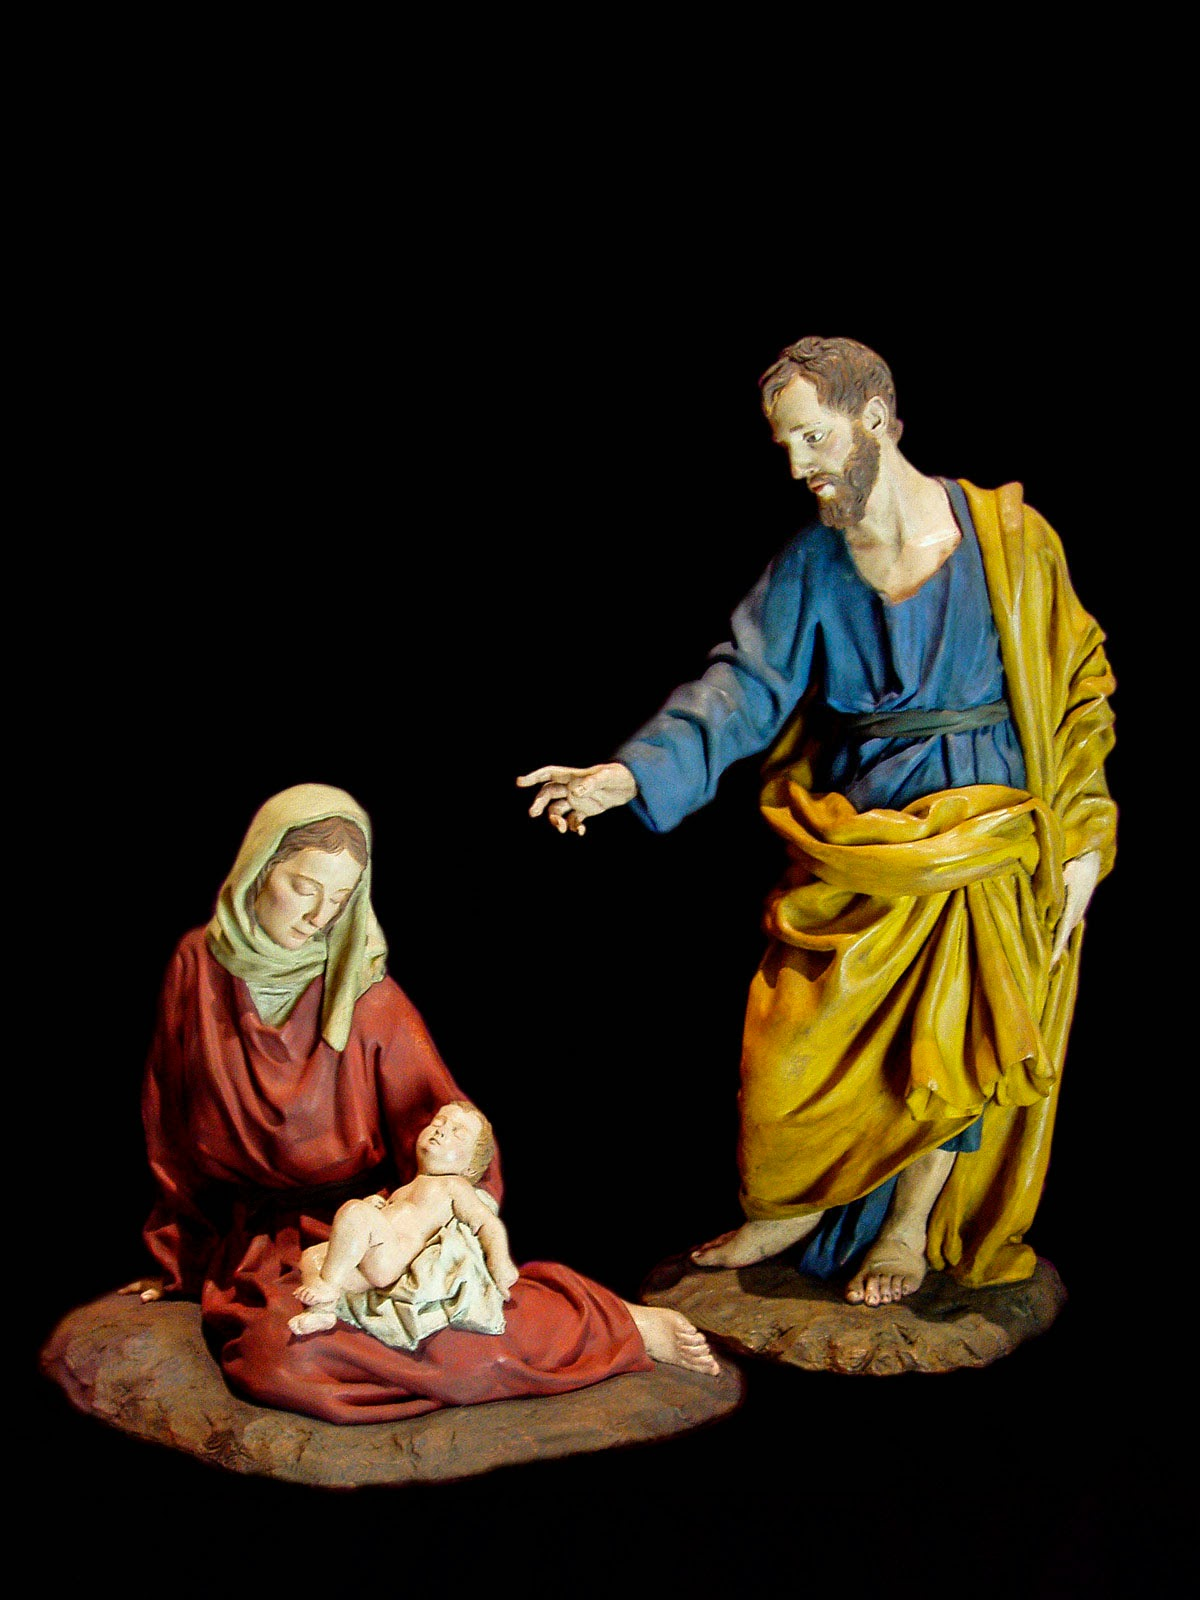 Nacimiento Belén Nativity krippe presepe Arturo Serra Gómez Barro cocido 12